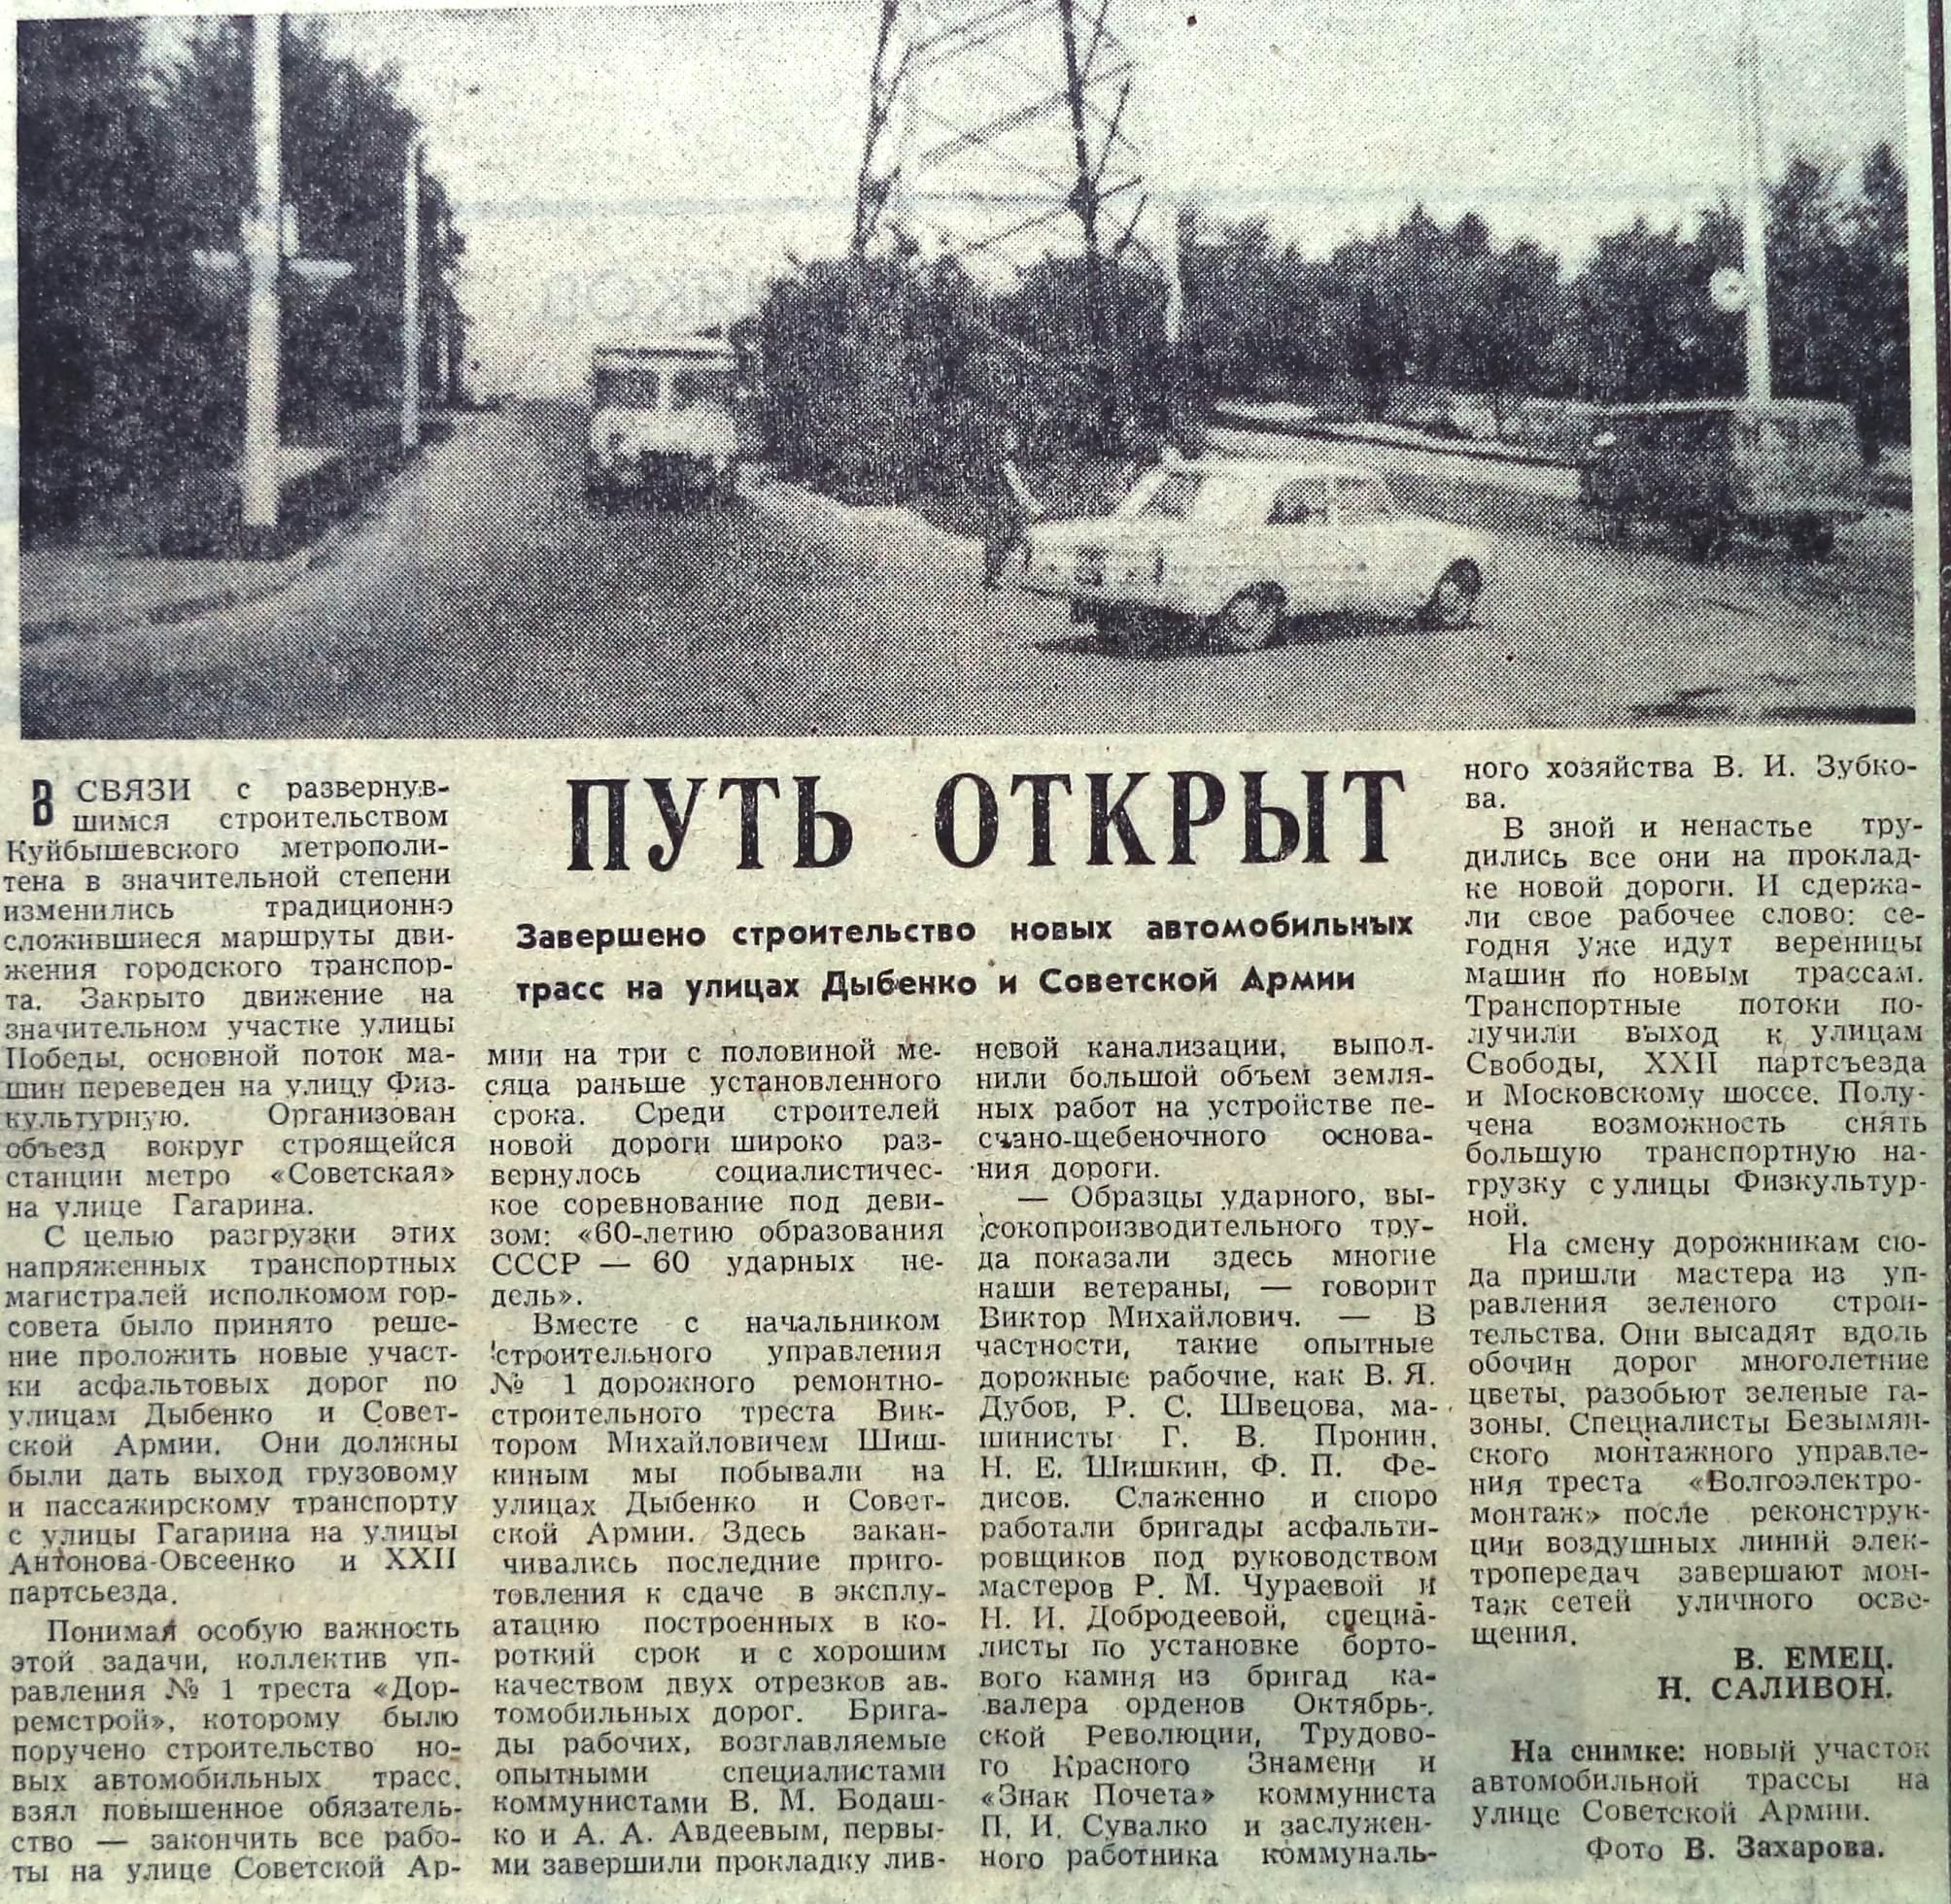 СА-ФОТО-073-ВЗя-1982-07-23-открытие движения по СА и Дыб-min